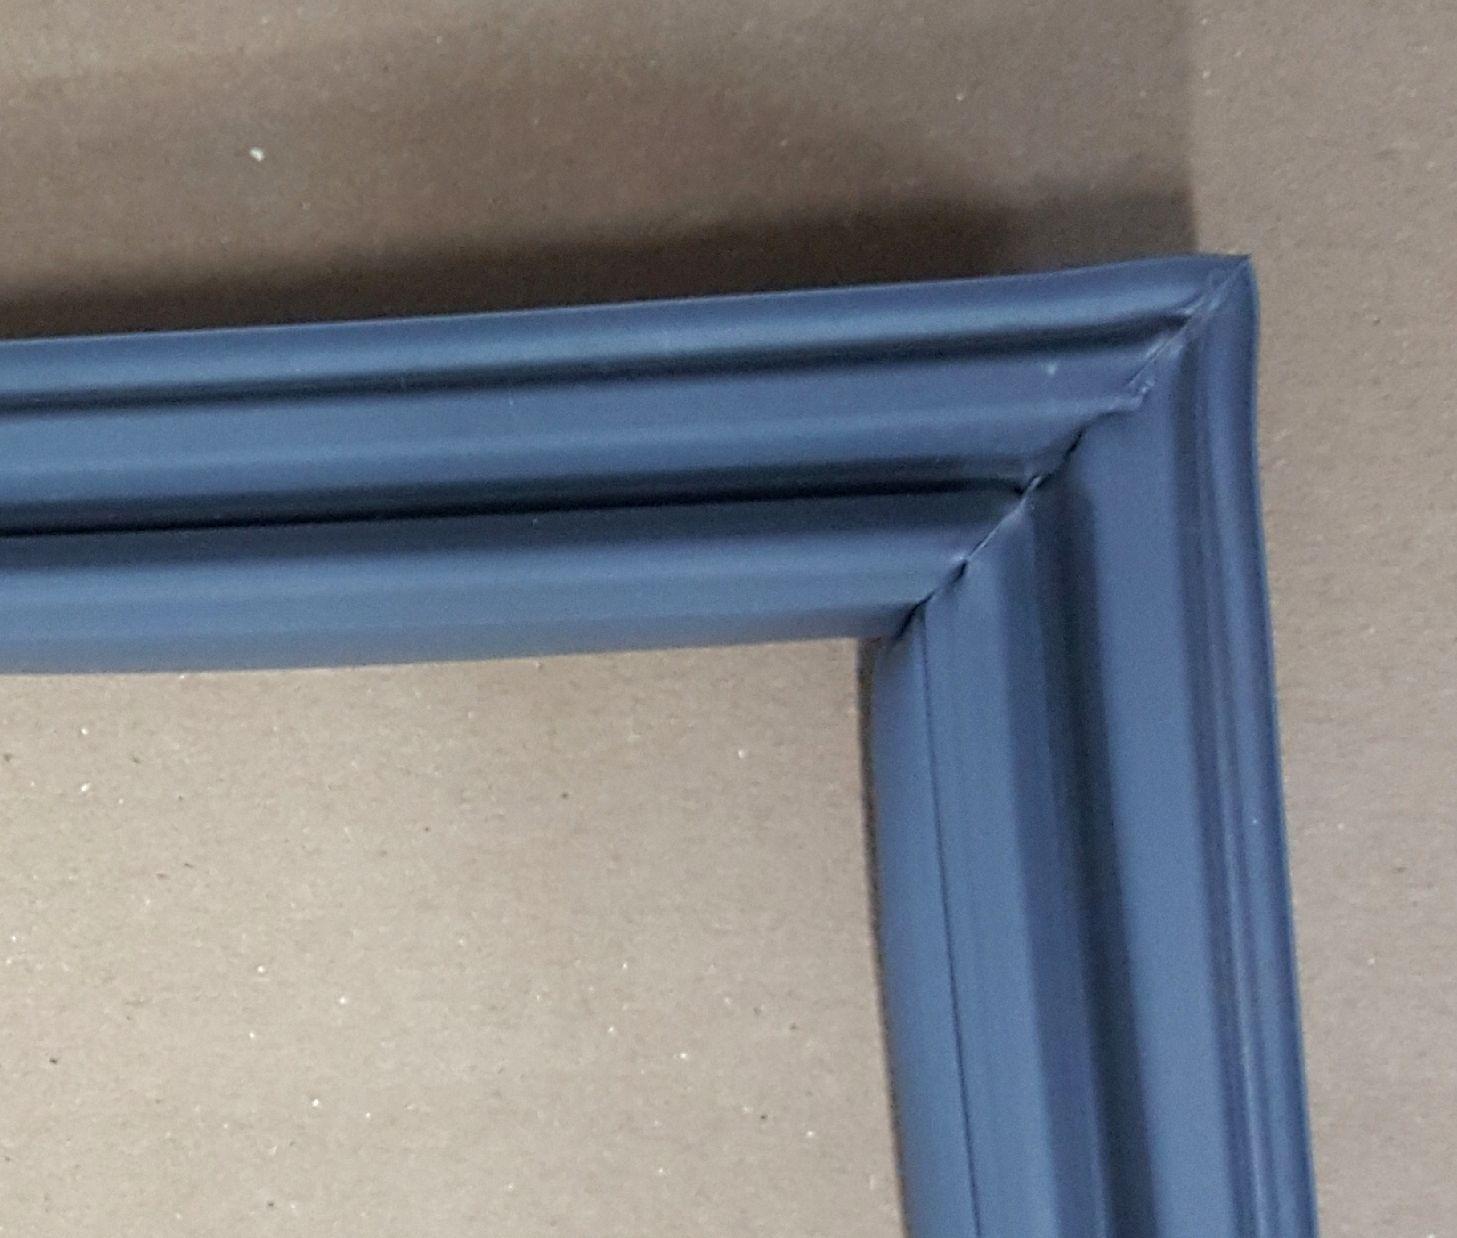 Borracha para Freezer METALFRIO Horizontal DA420 - Medida: 61 x 65 cm - Encaixe ** CONFIRA AS MEDIDAS **